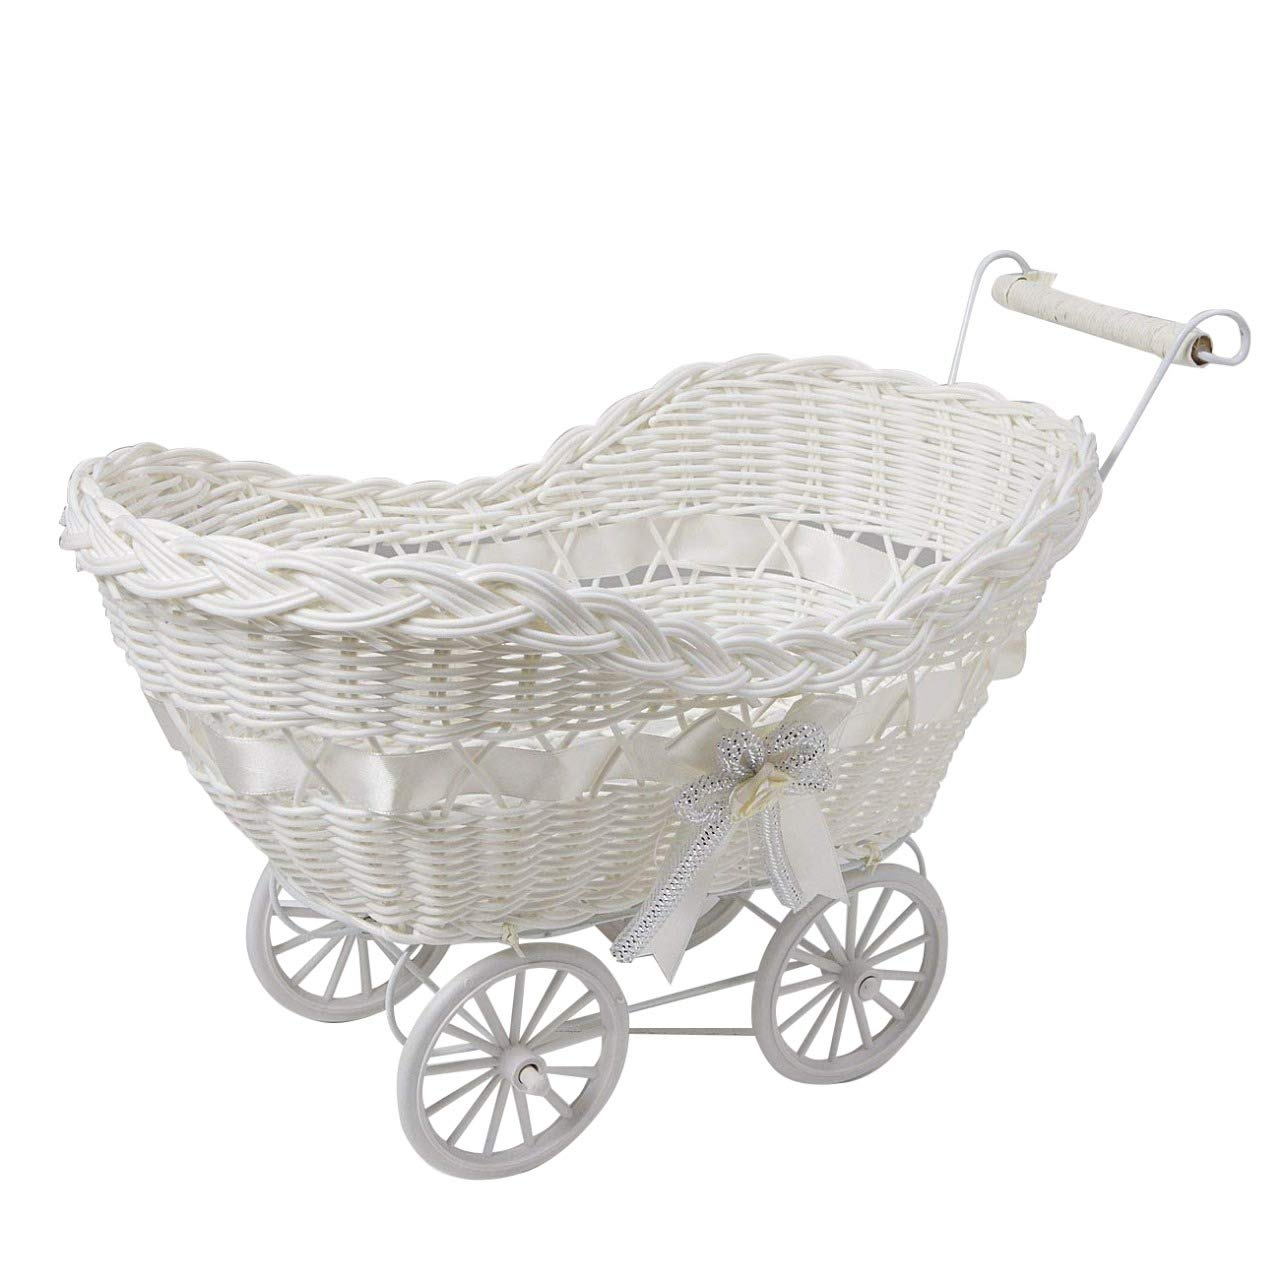 Christmas Gift for Boy & Girl Baby Pram Basket Wicker Hamper Baby Shower or Newborn Baby Gifts Xmas Present (Blue) SAFRI®